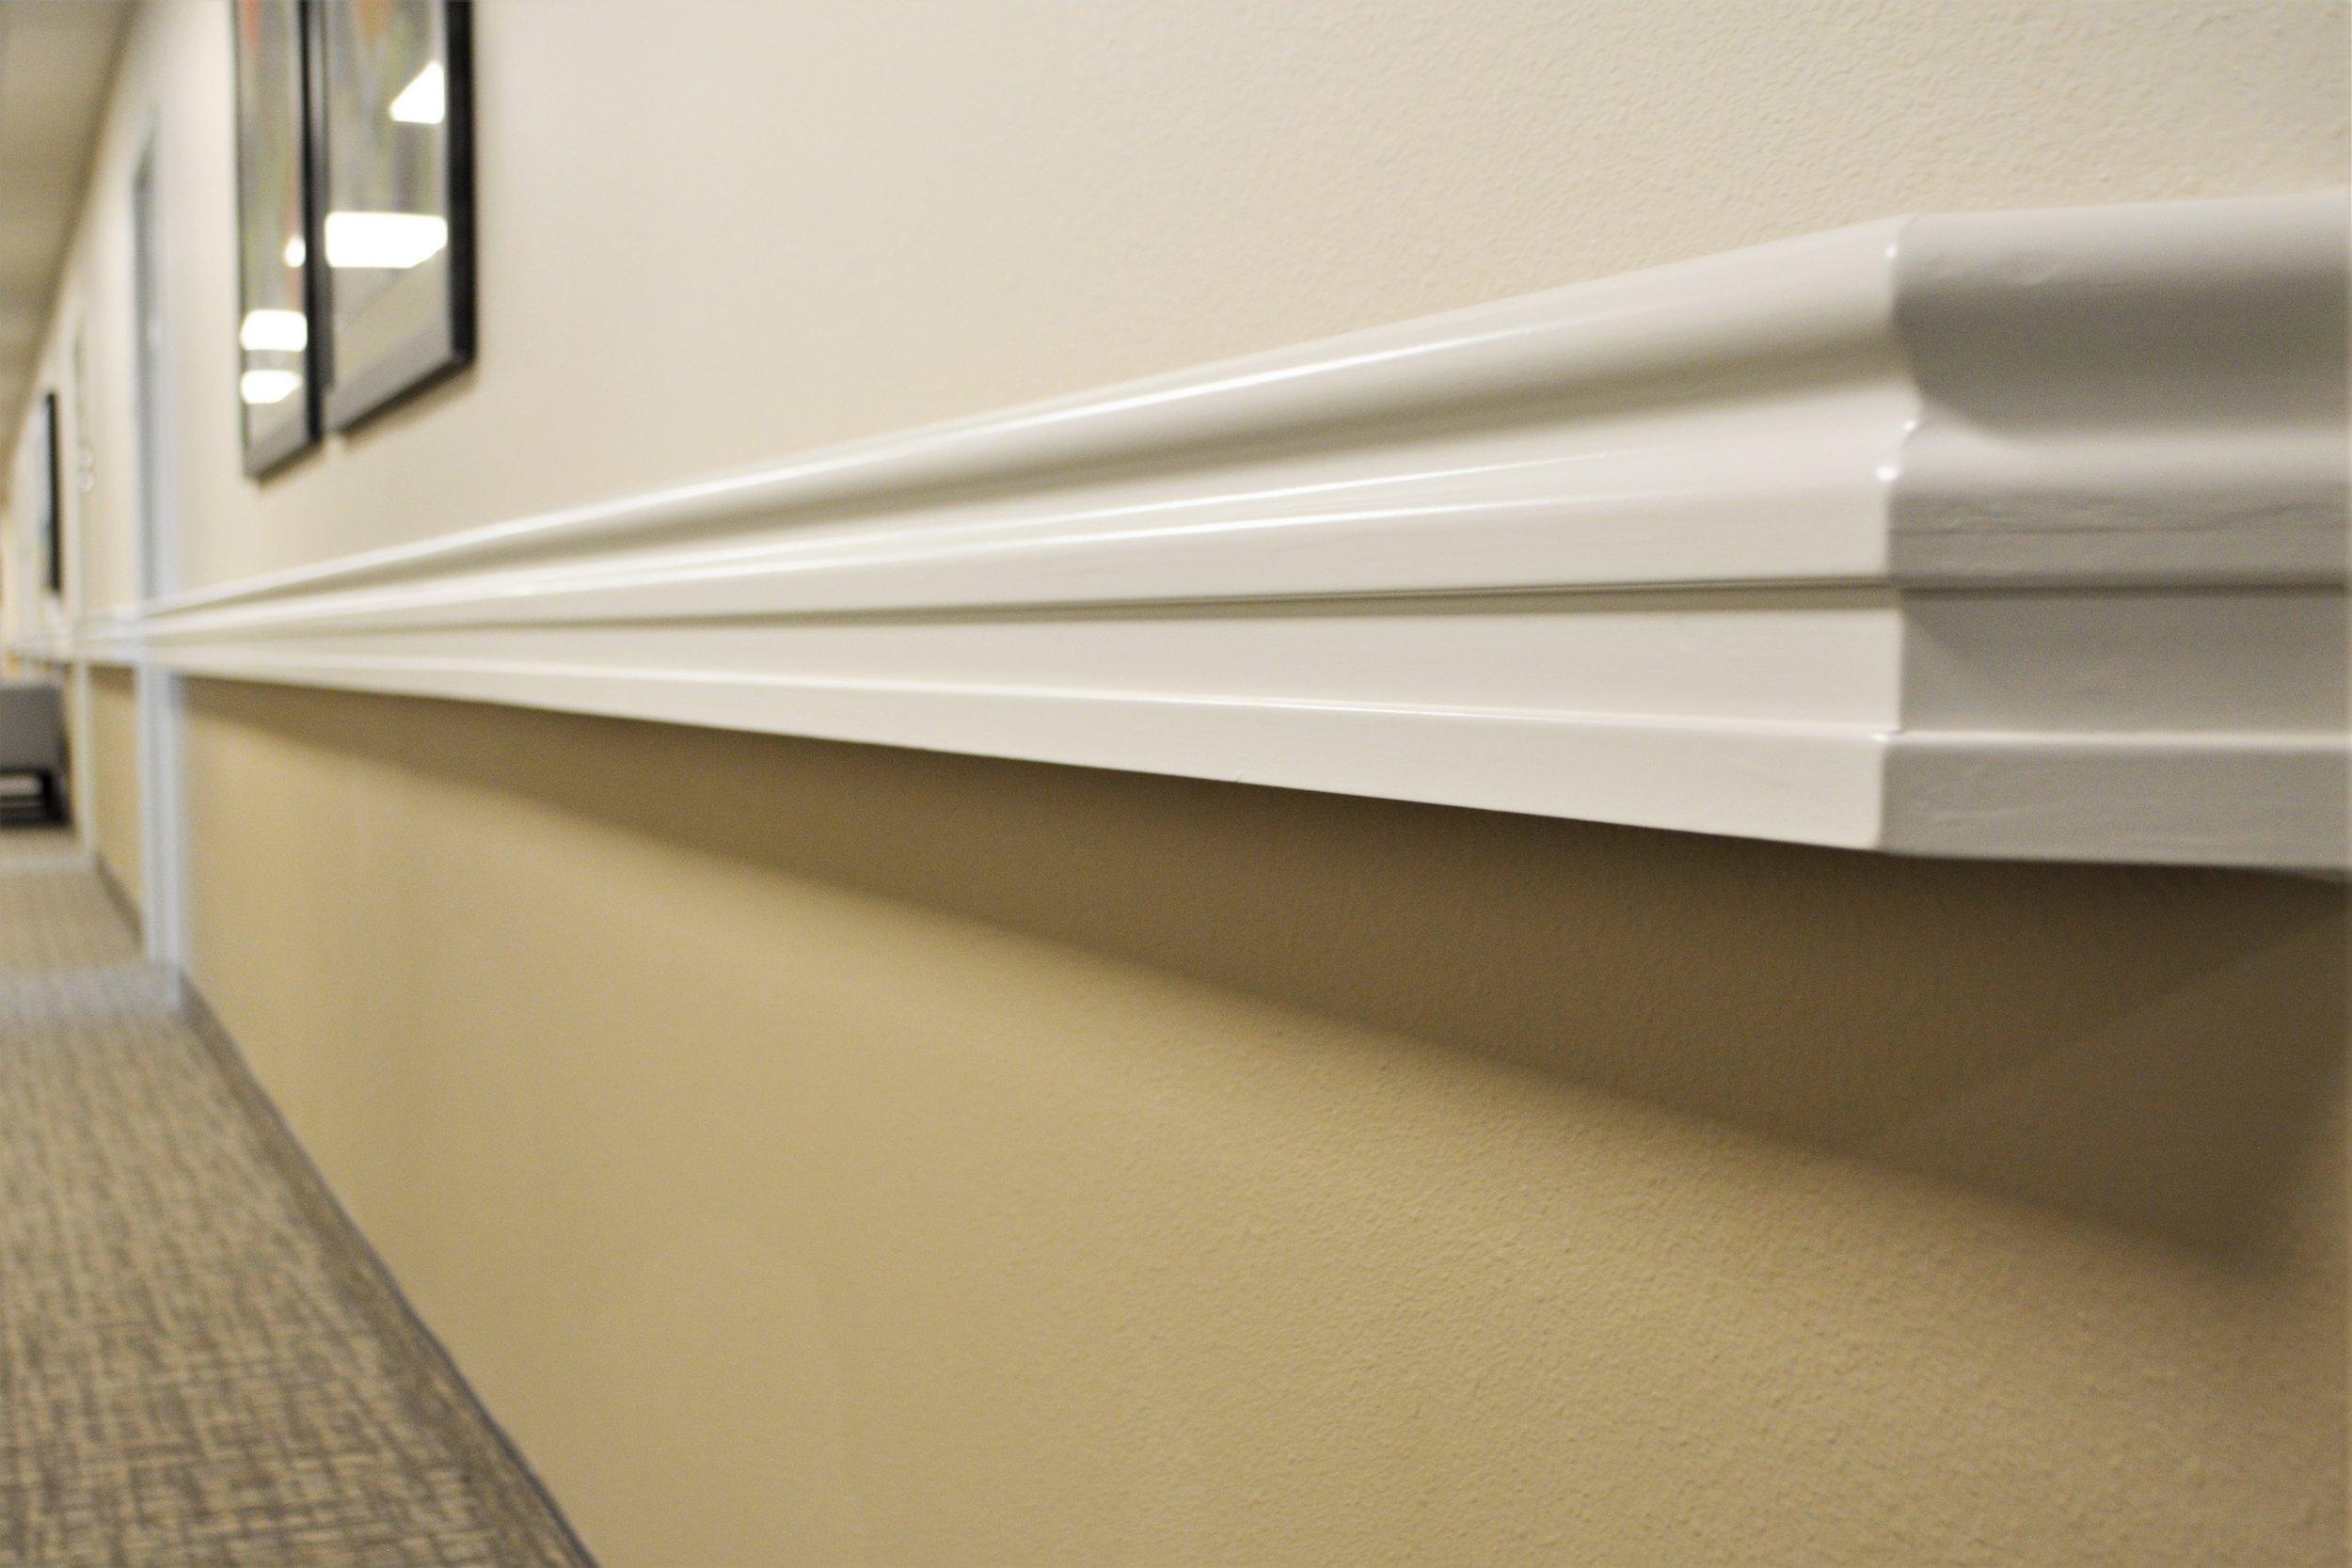 handrail closeup.JPG